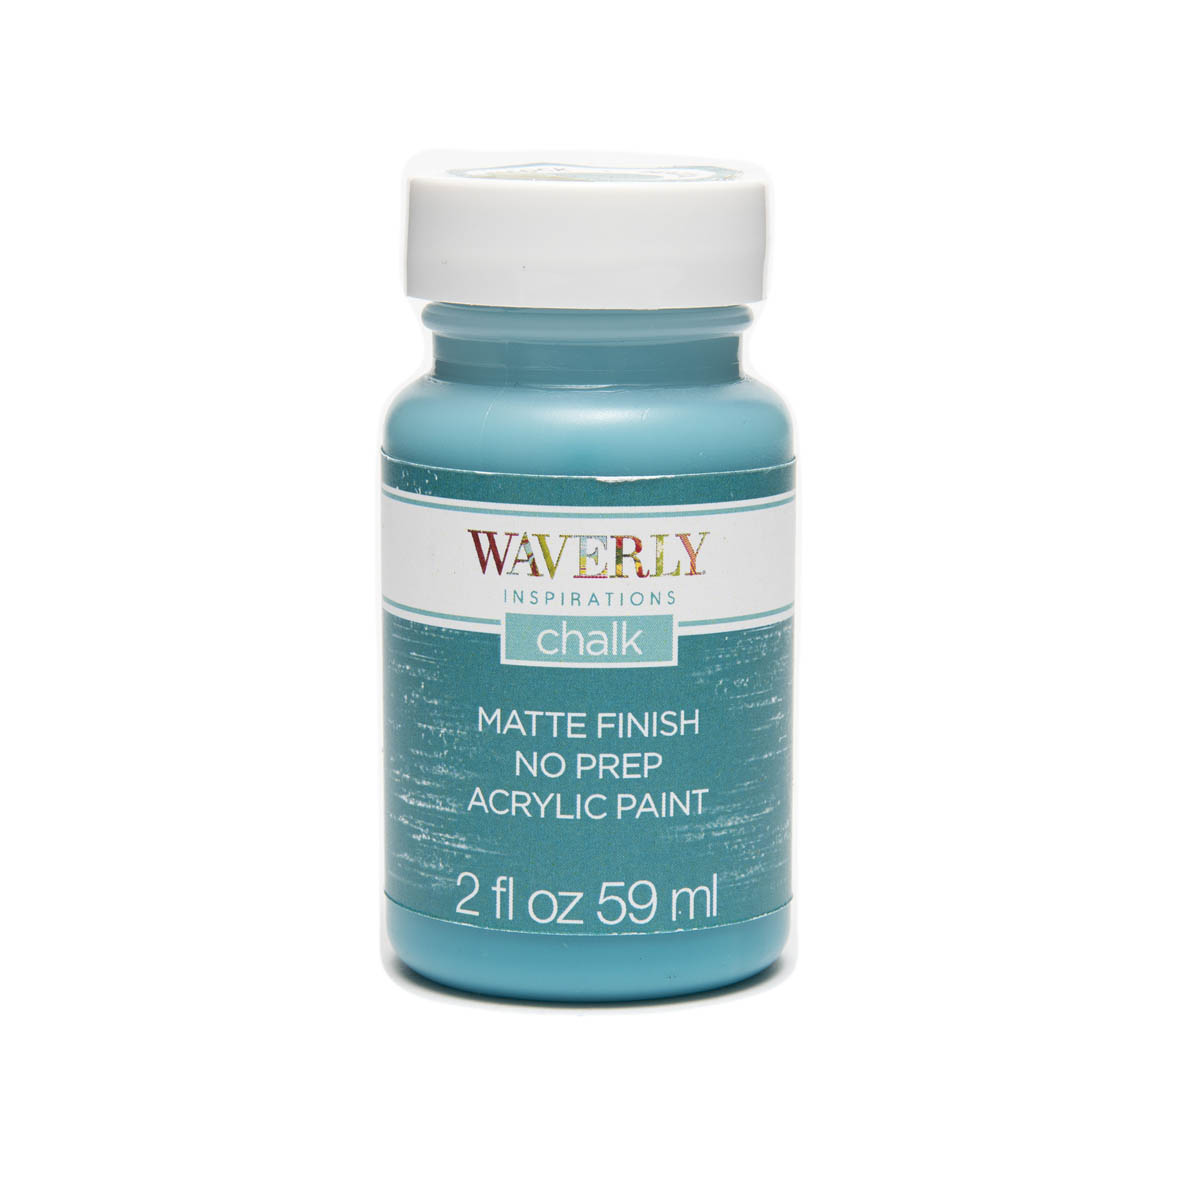 Waverly ® Inspirations Chalk Finish Acrylic Paint - Peacock, 2 oz. - 60890E